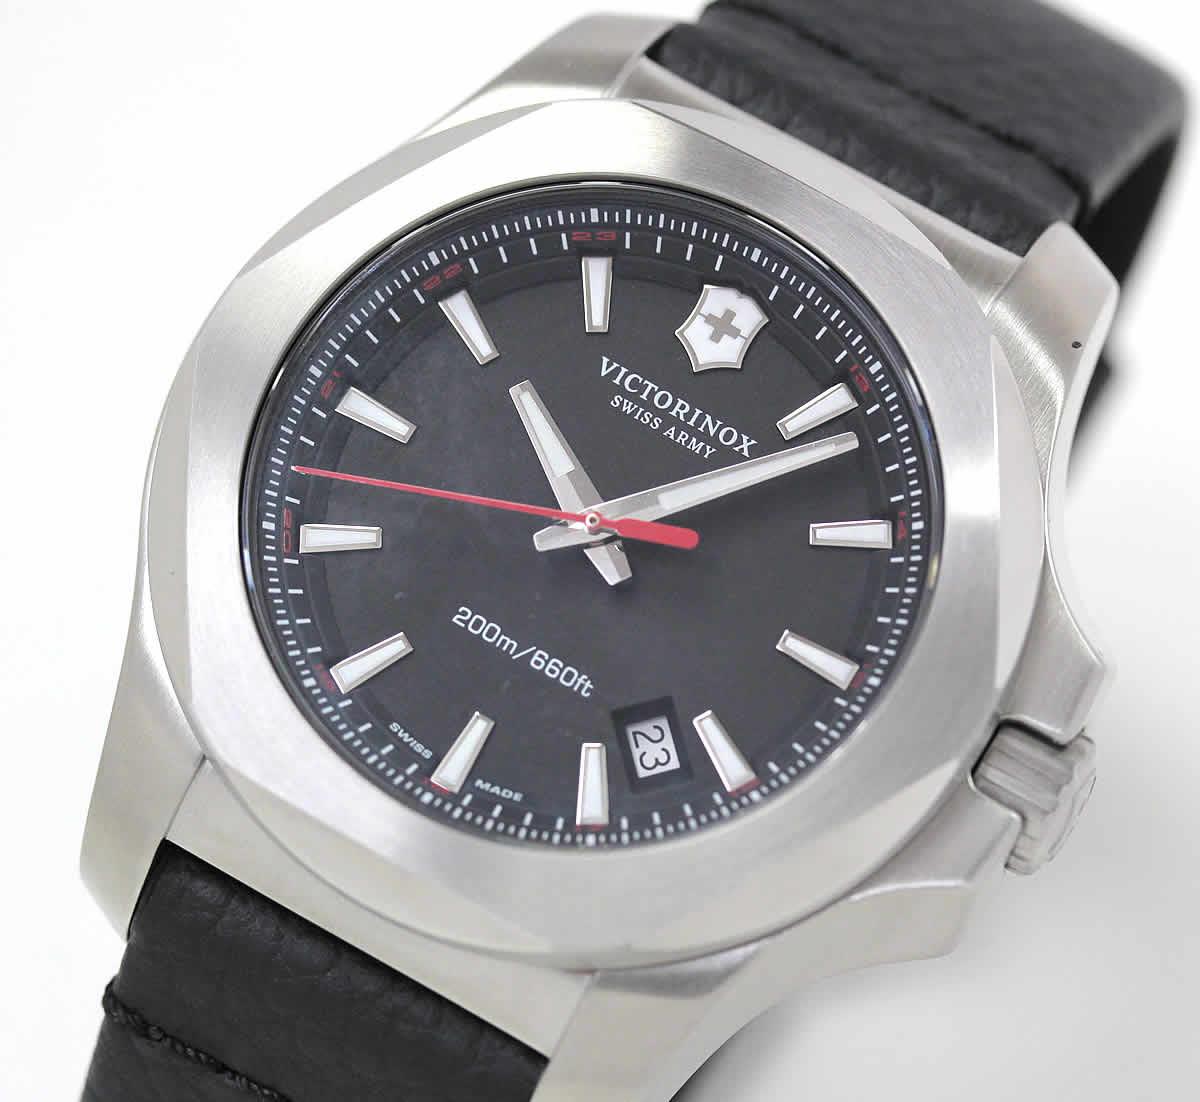 INOX ビクトリノックス  腕時計